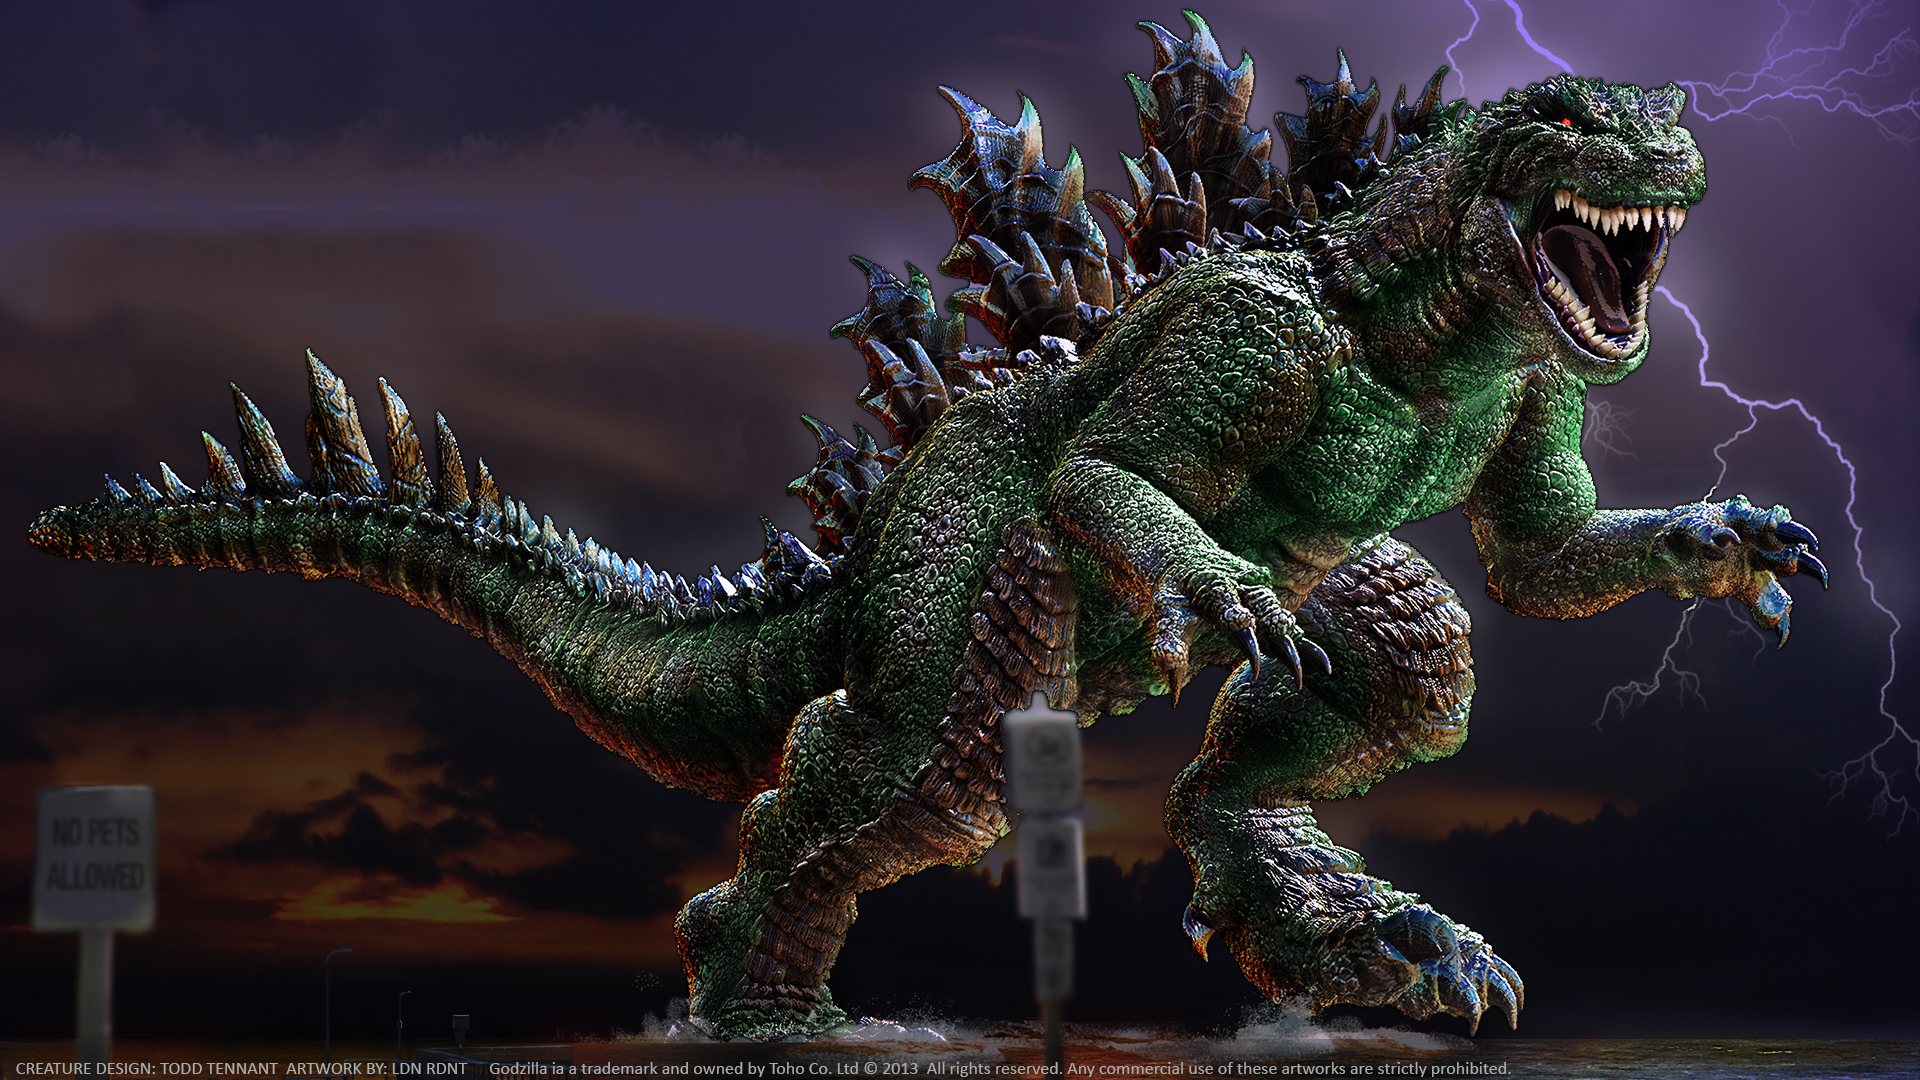 Godzilla 1920x1080 by MrOldman on DeviantArt